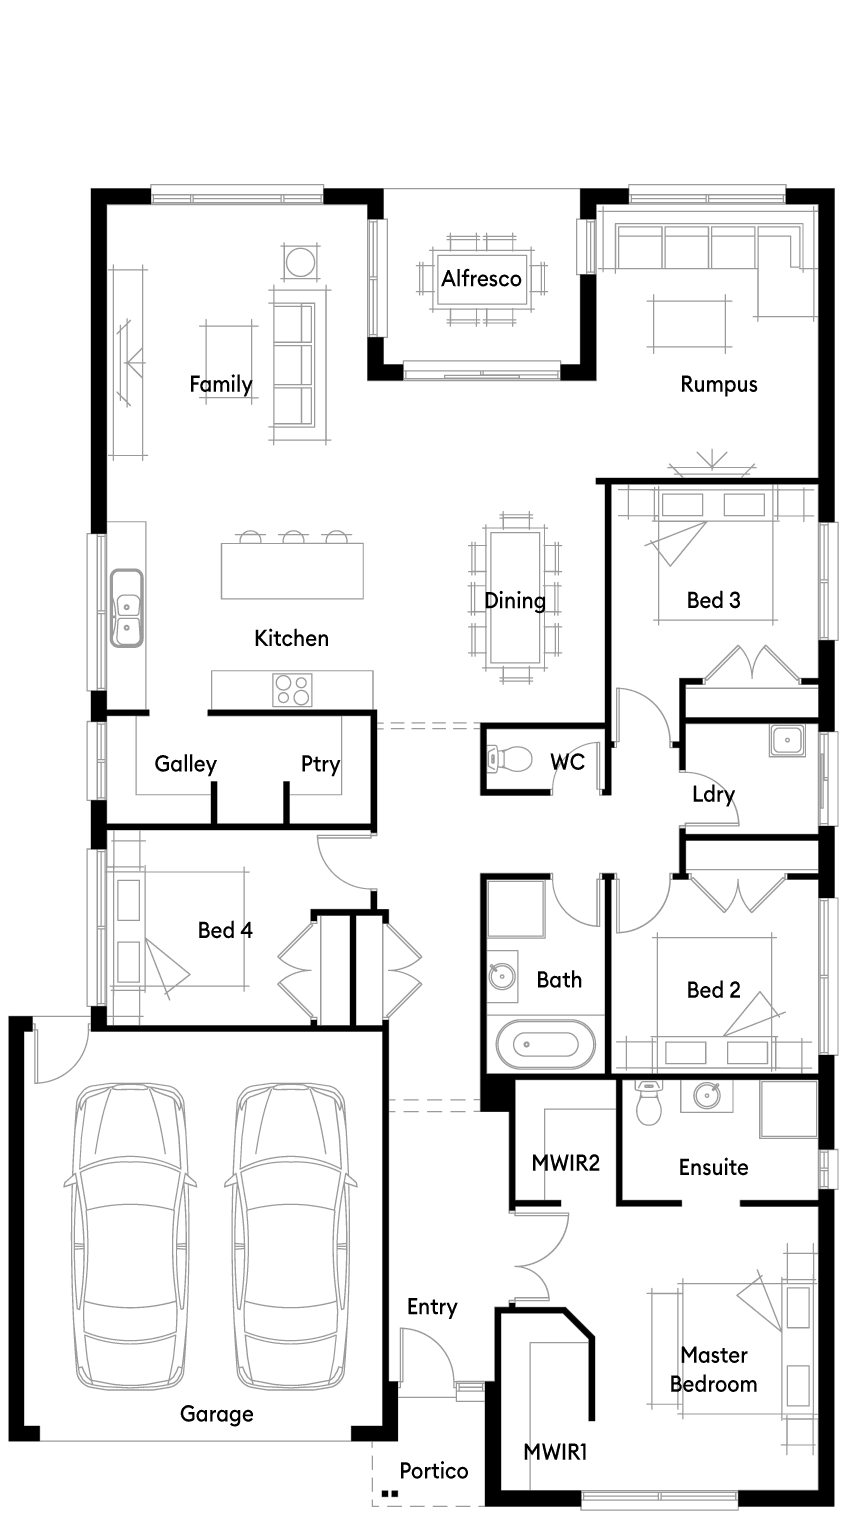 FloorPlan1_HOUSE761_Liverpool_25-3